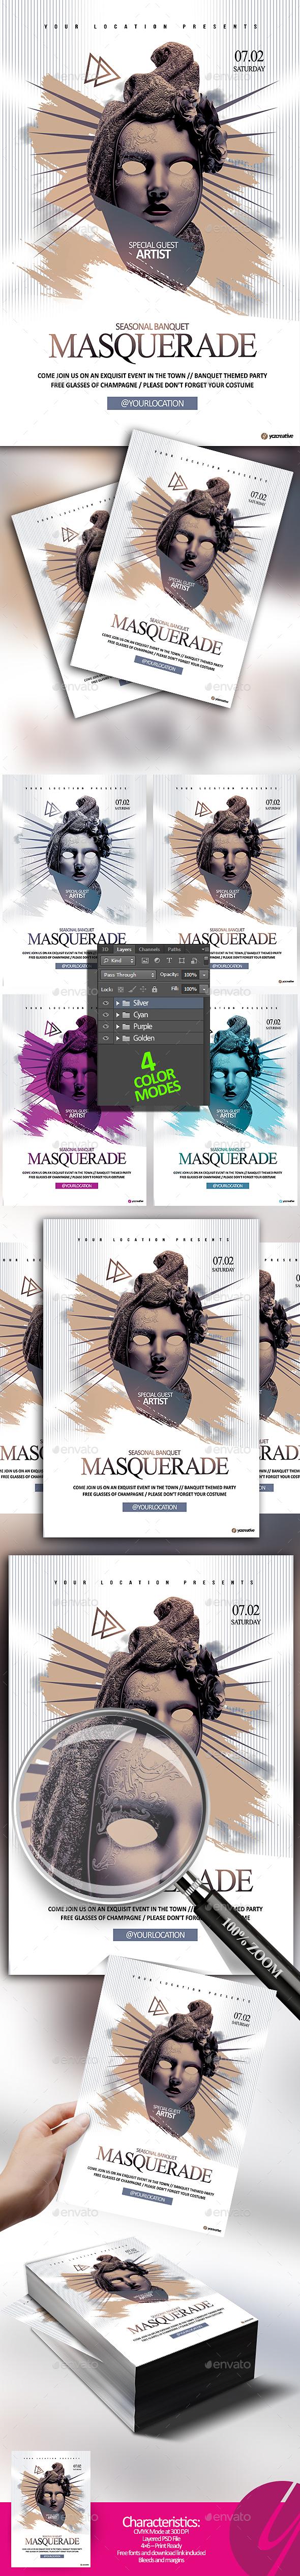 Masquerade Banquet - Events Flyers